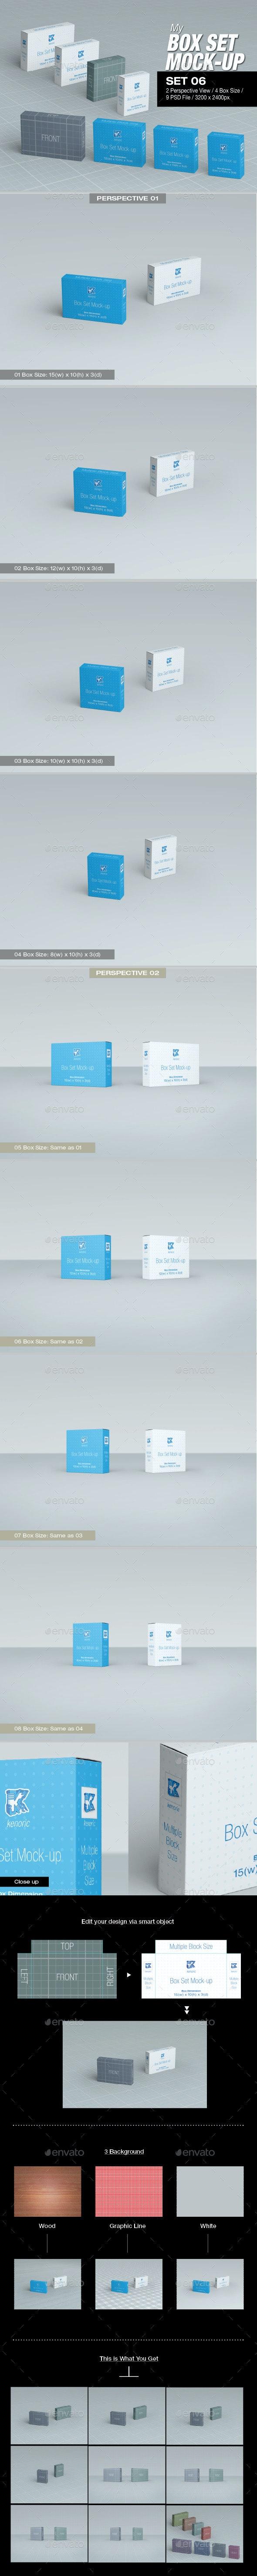 MyBox Set Mock-up - Set 06 - Packaging Product Mock-Ups